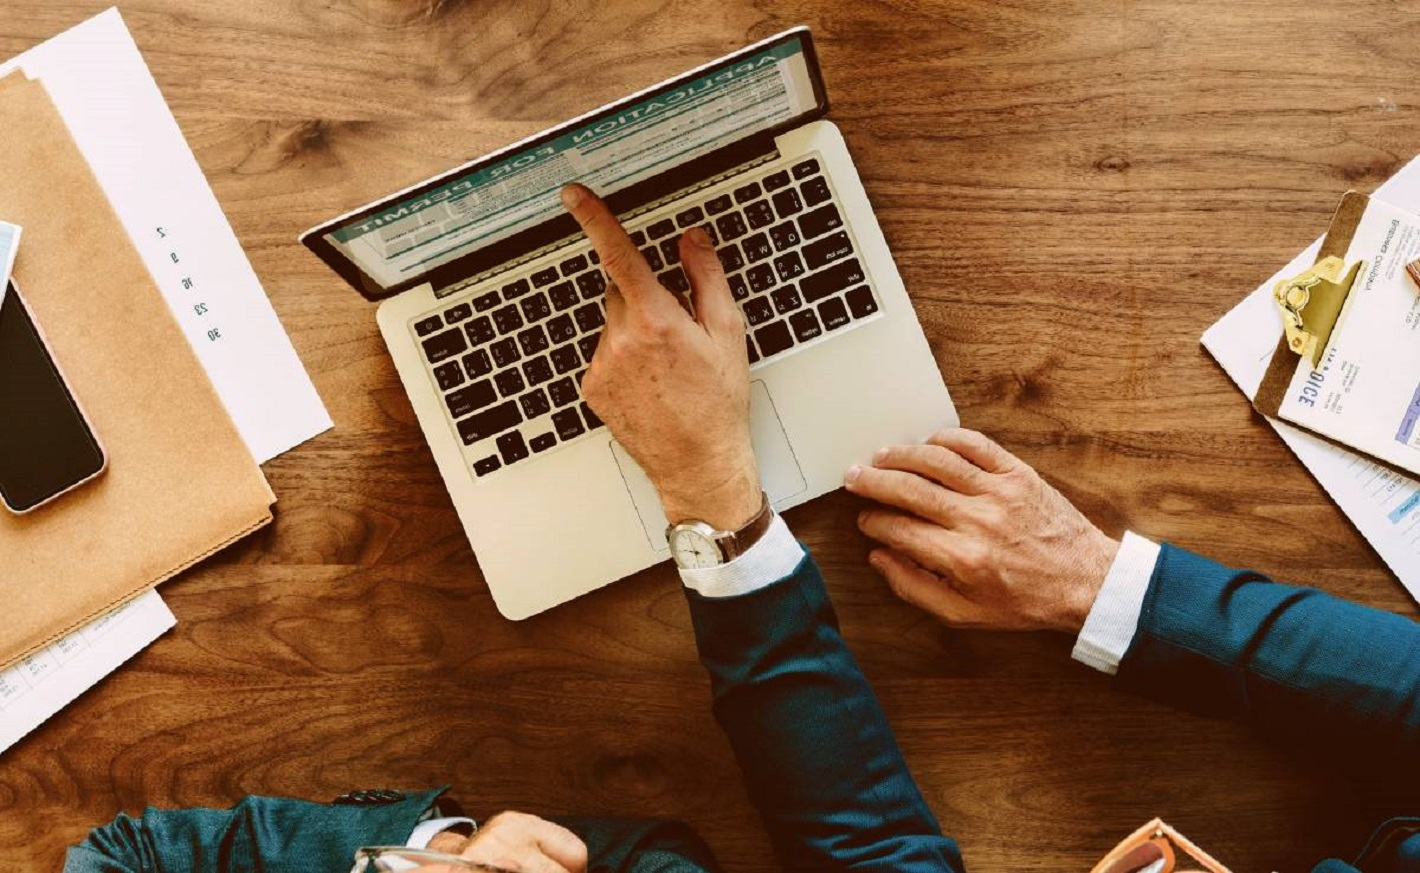 Como crear un Área de miembros en WordPress restringida o MEMBRESÍA